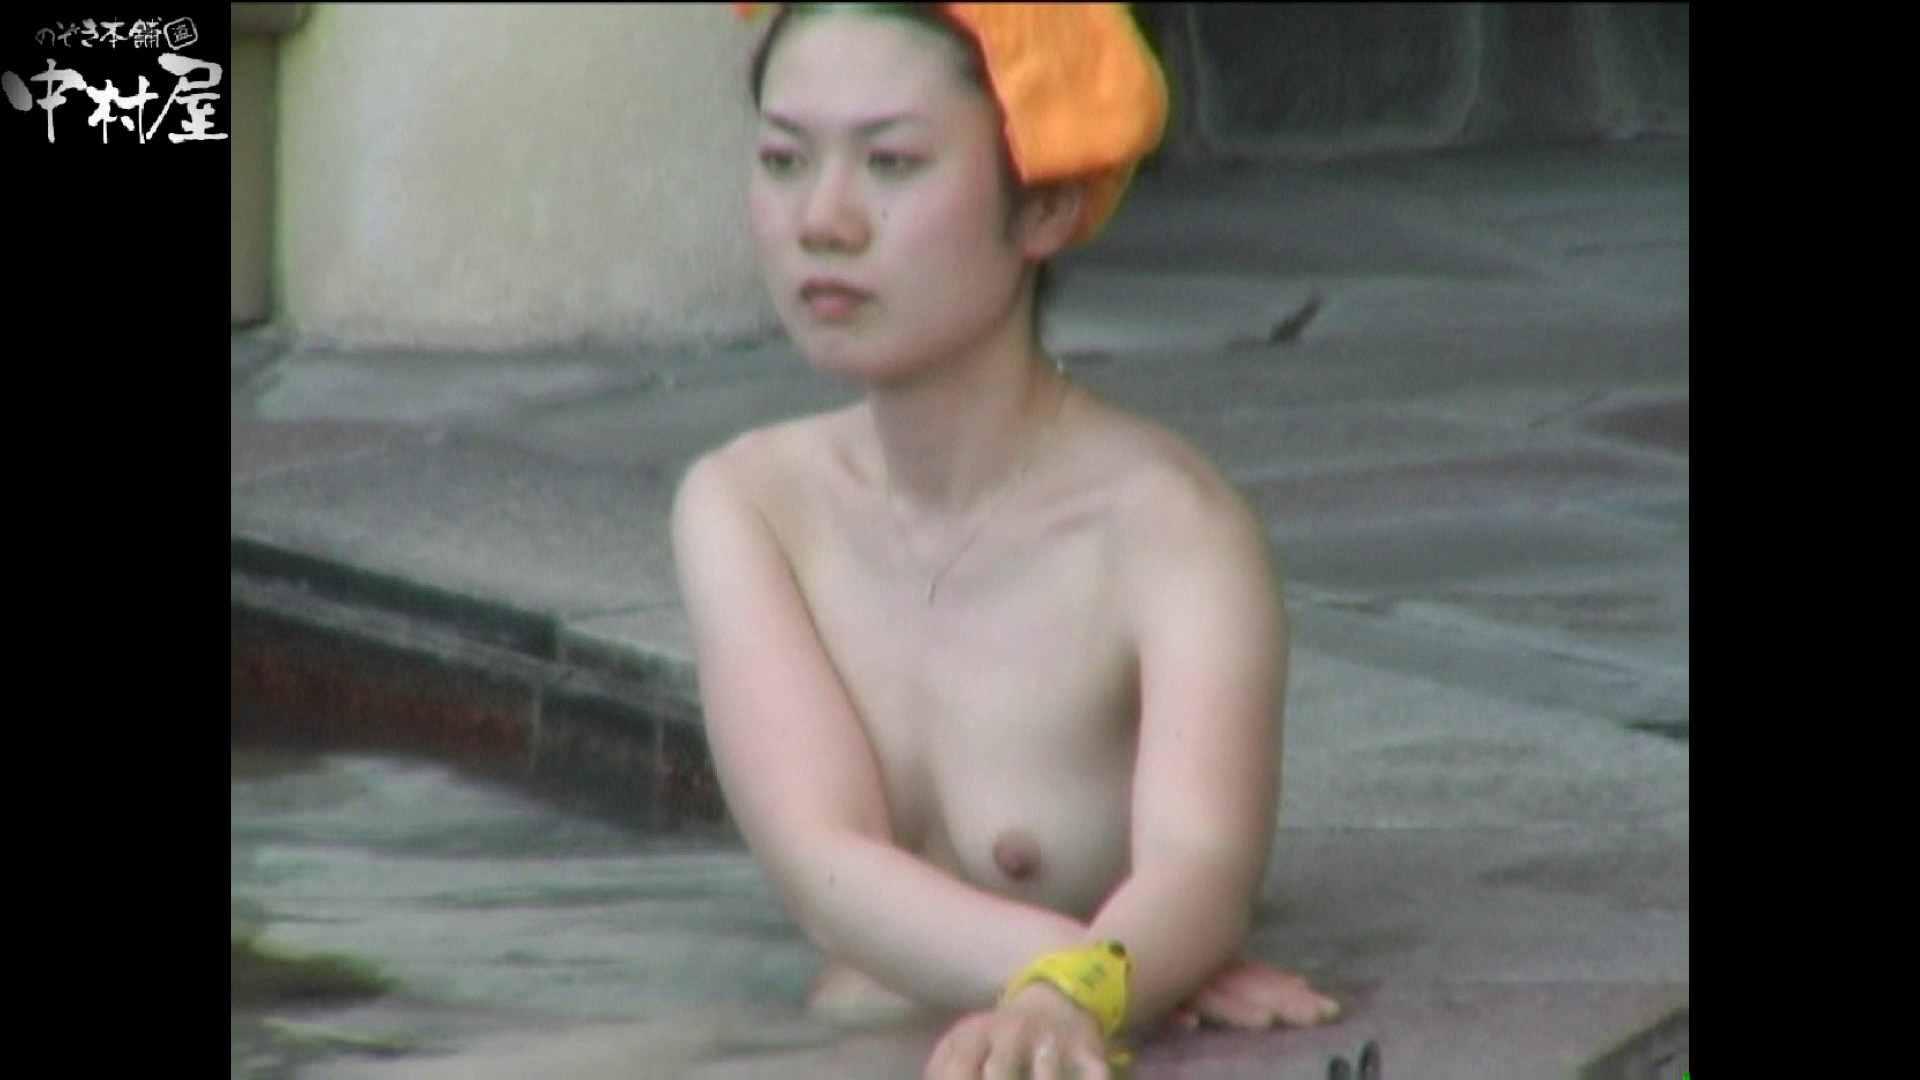 Aquaな露天風呂Vol.978 OLセックス | 露天  77画像 76